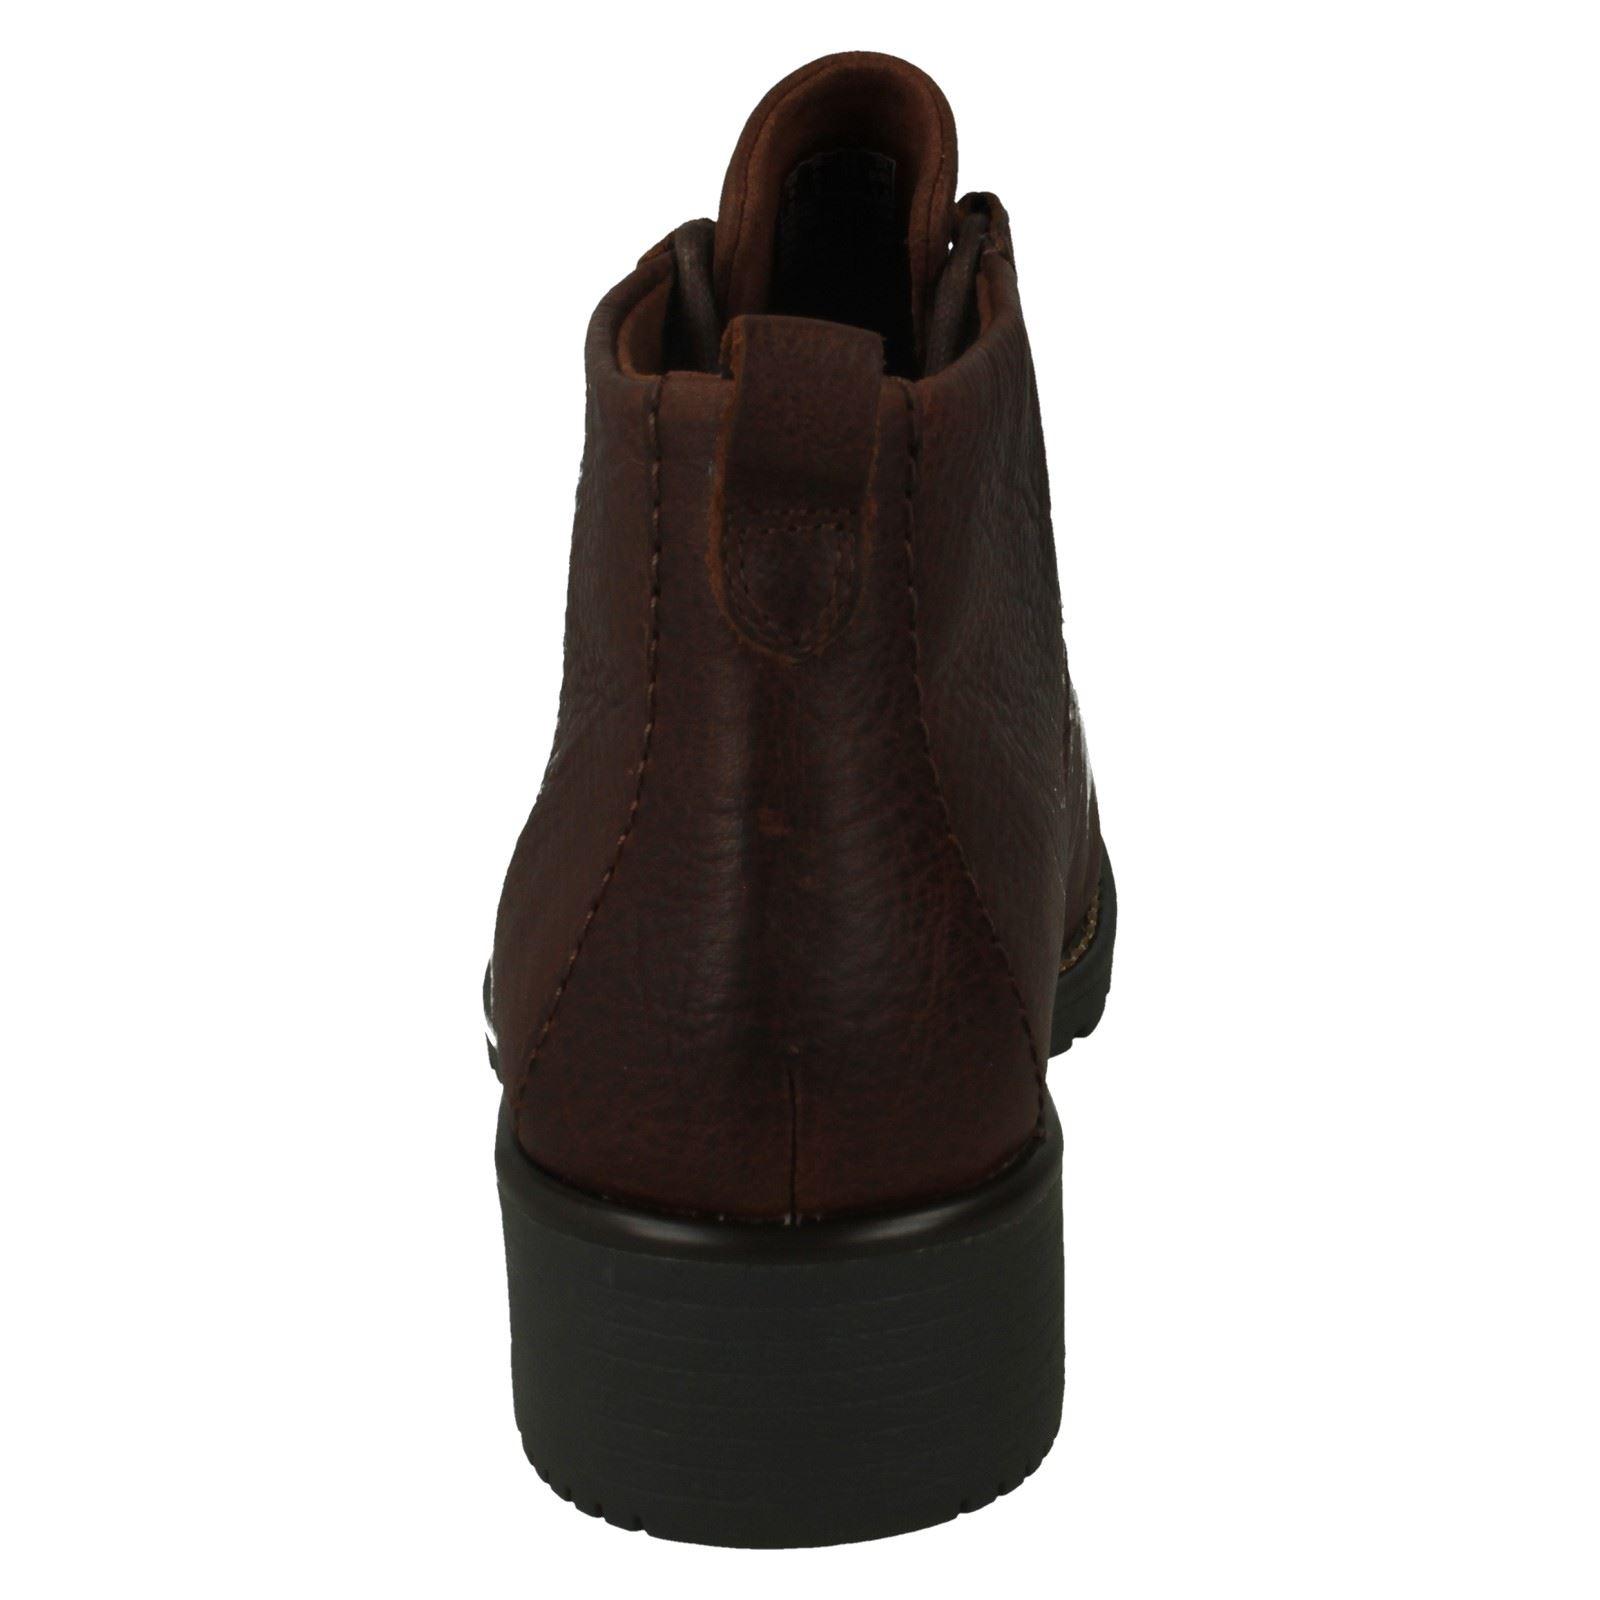 mesdames clarks warmlined cuir bottines orinoco orinoco orinoco oaks | Vendre Prix  7a6a63